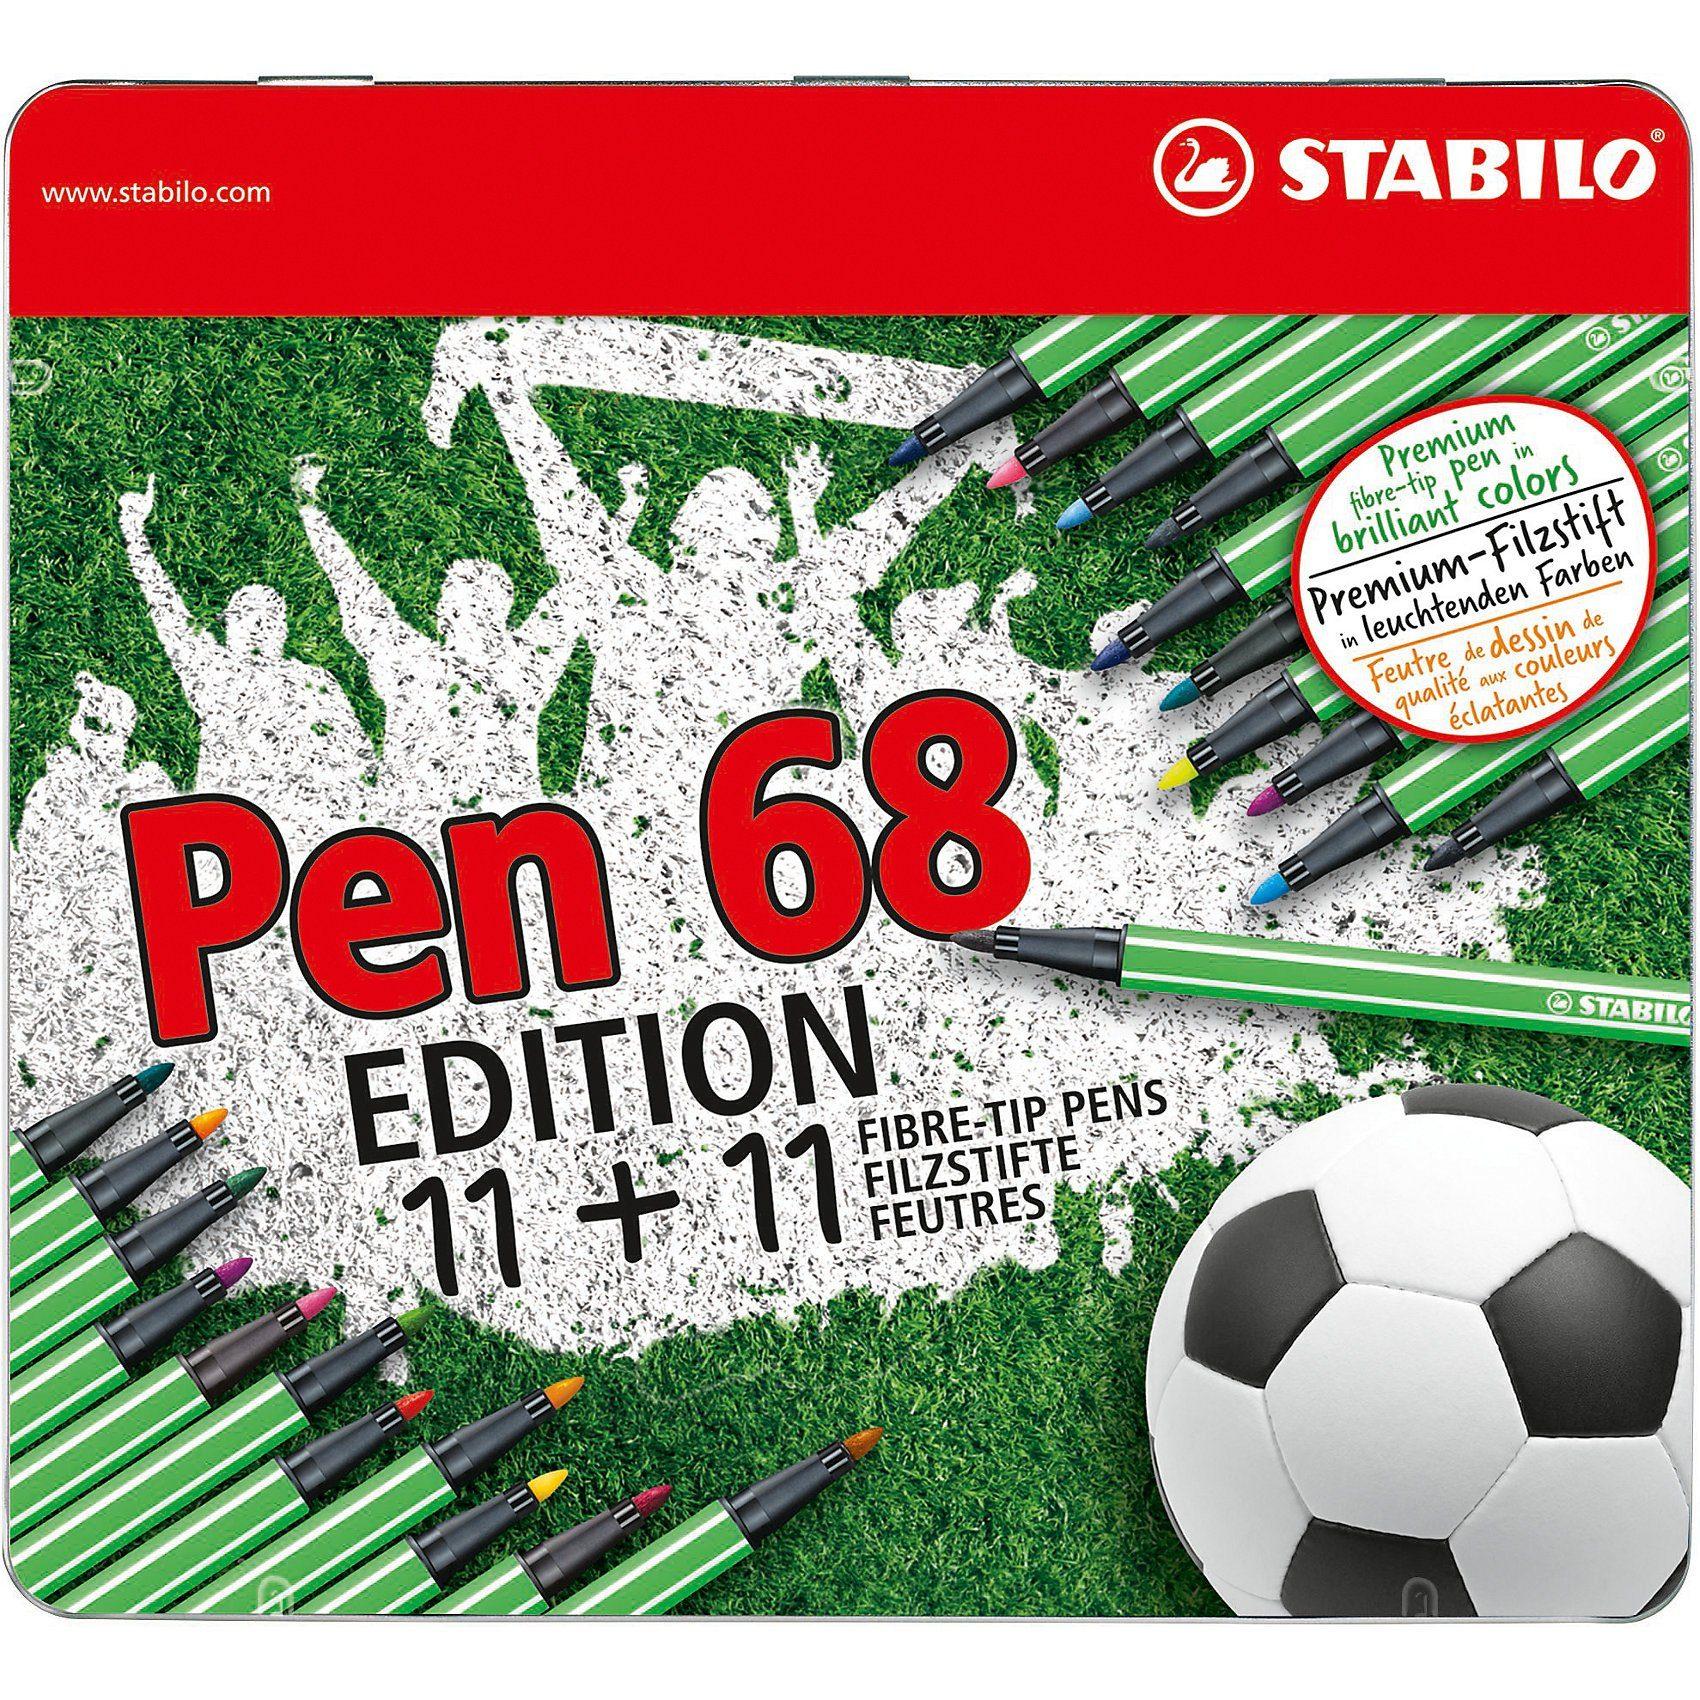 STABILO Filzstifte Pen 68 Fußball Edition, 22 Stifte